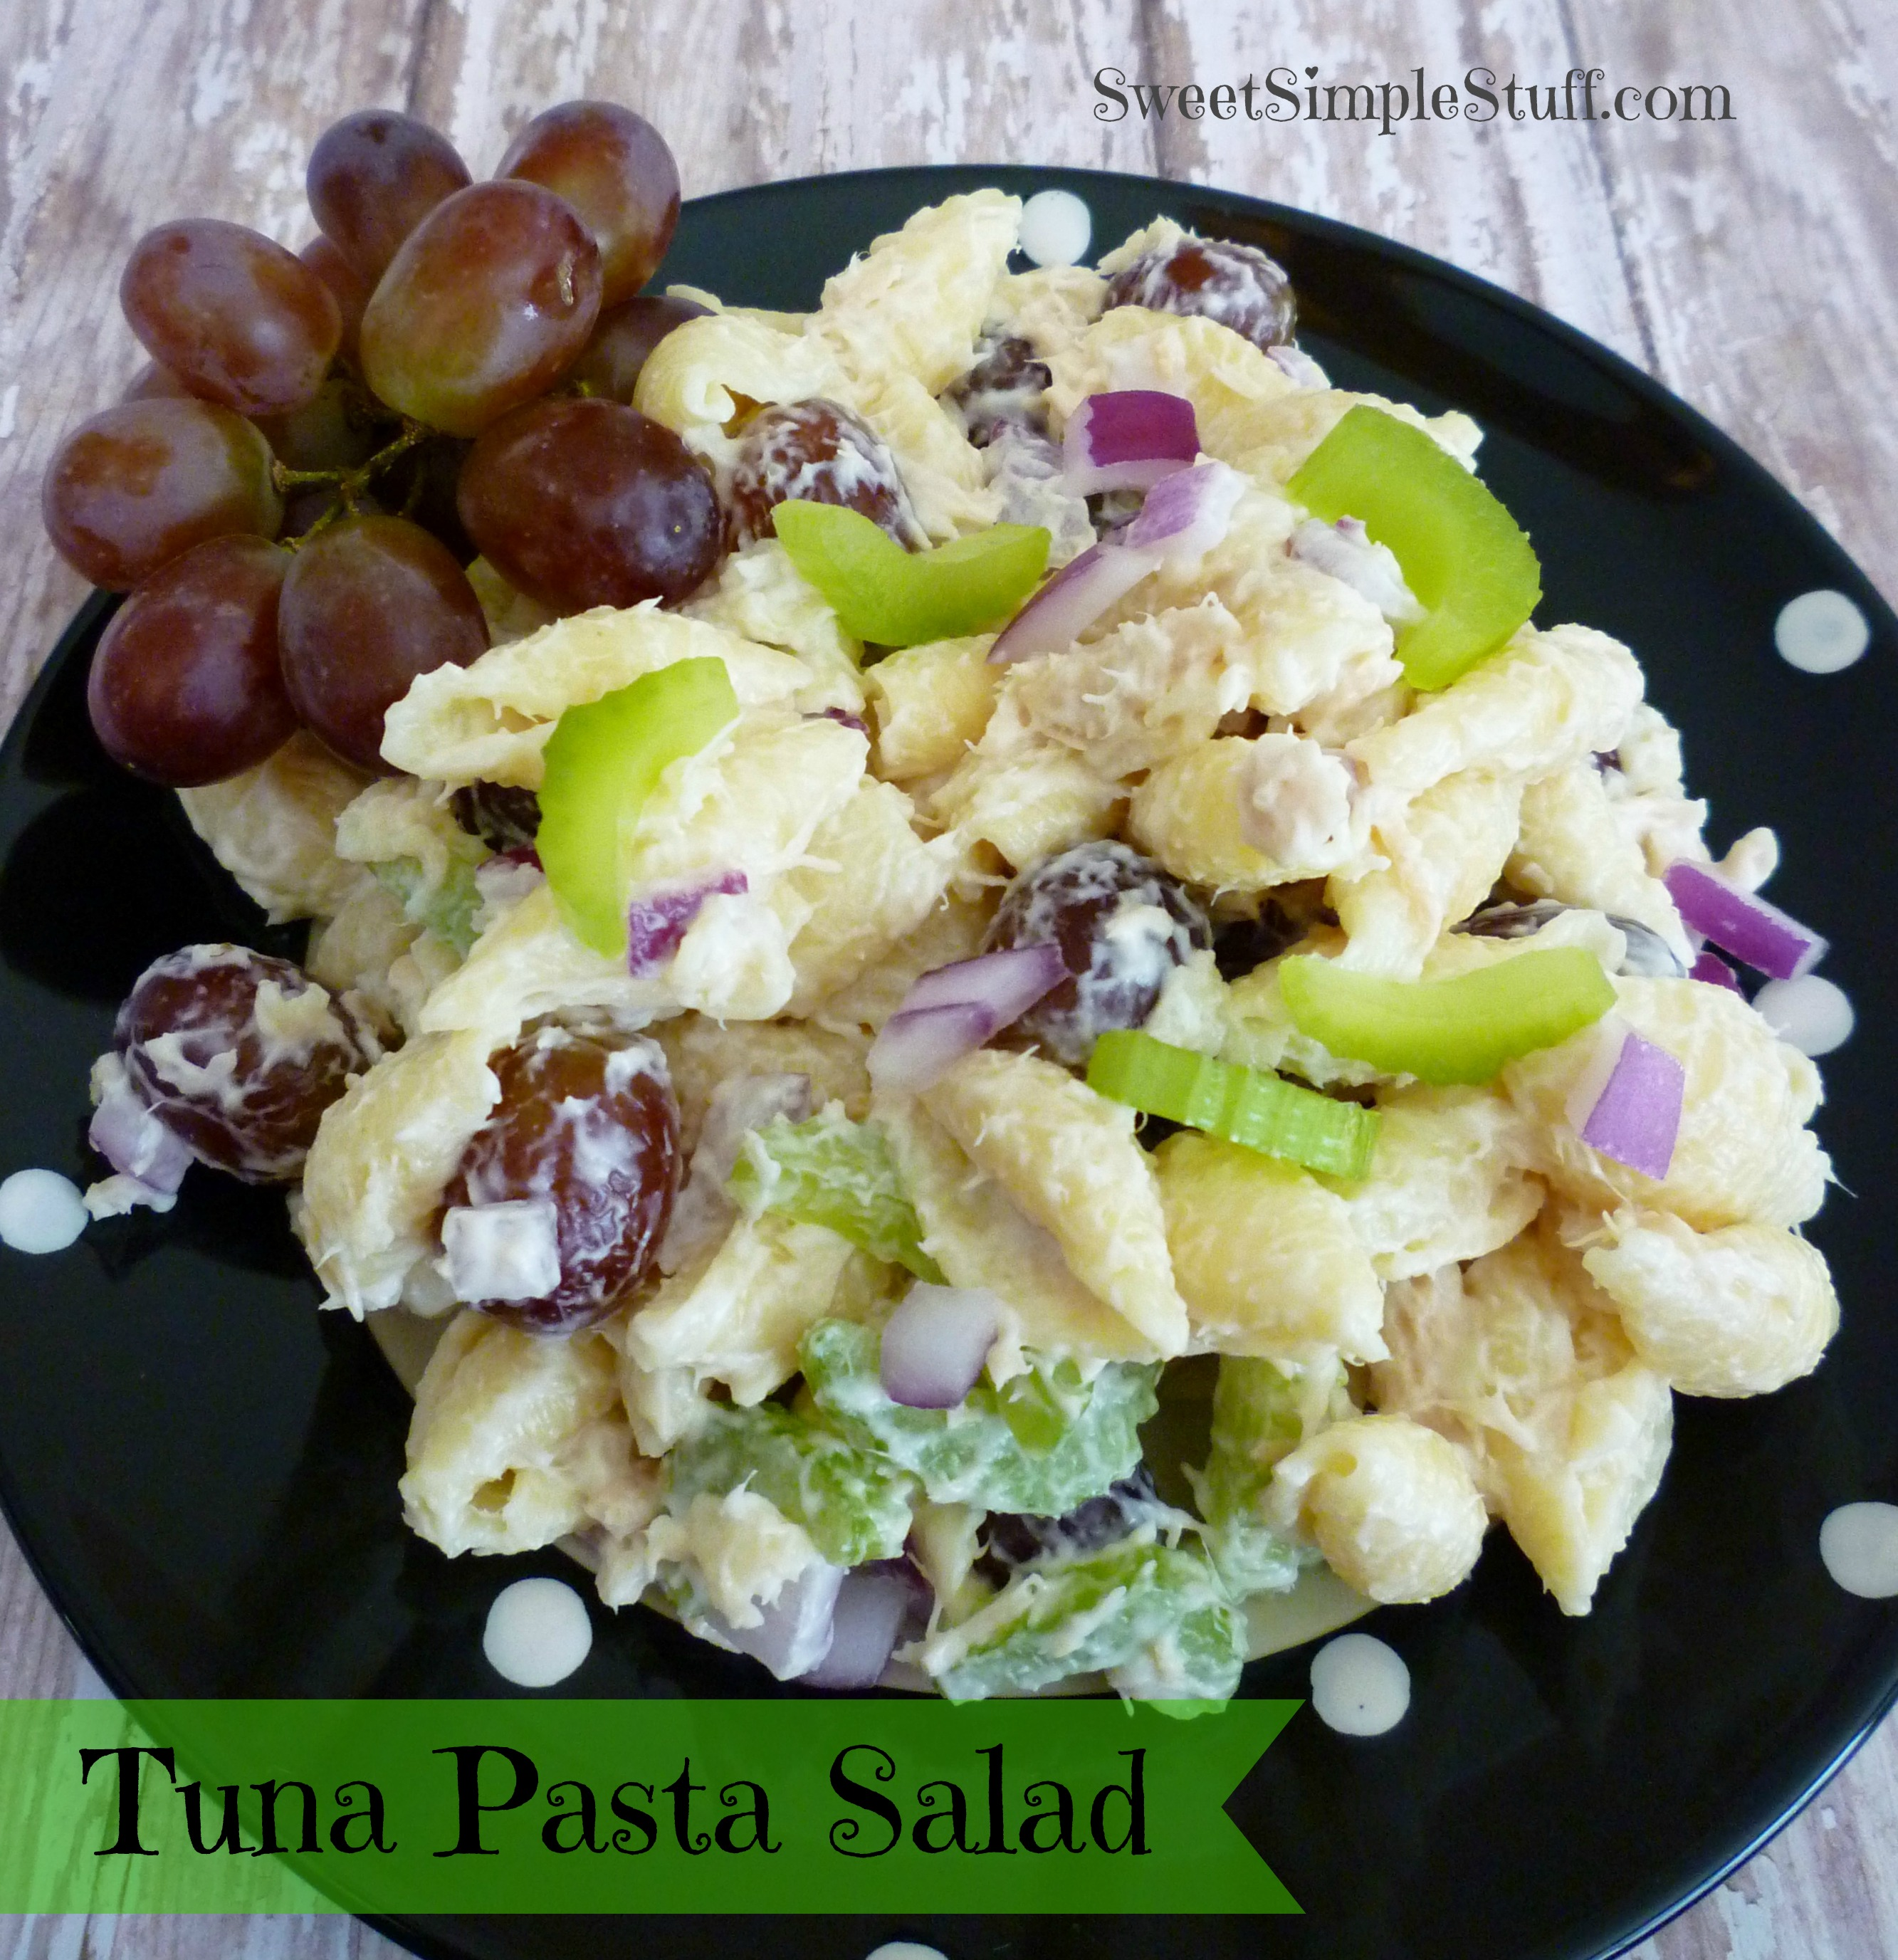 Tuna pasta salad sweet simple stuff for Tuna fish pasta salad